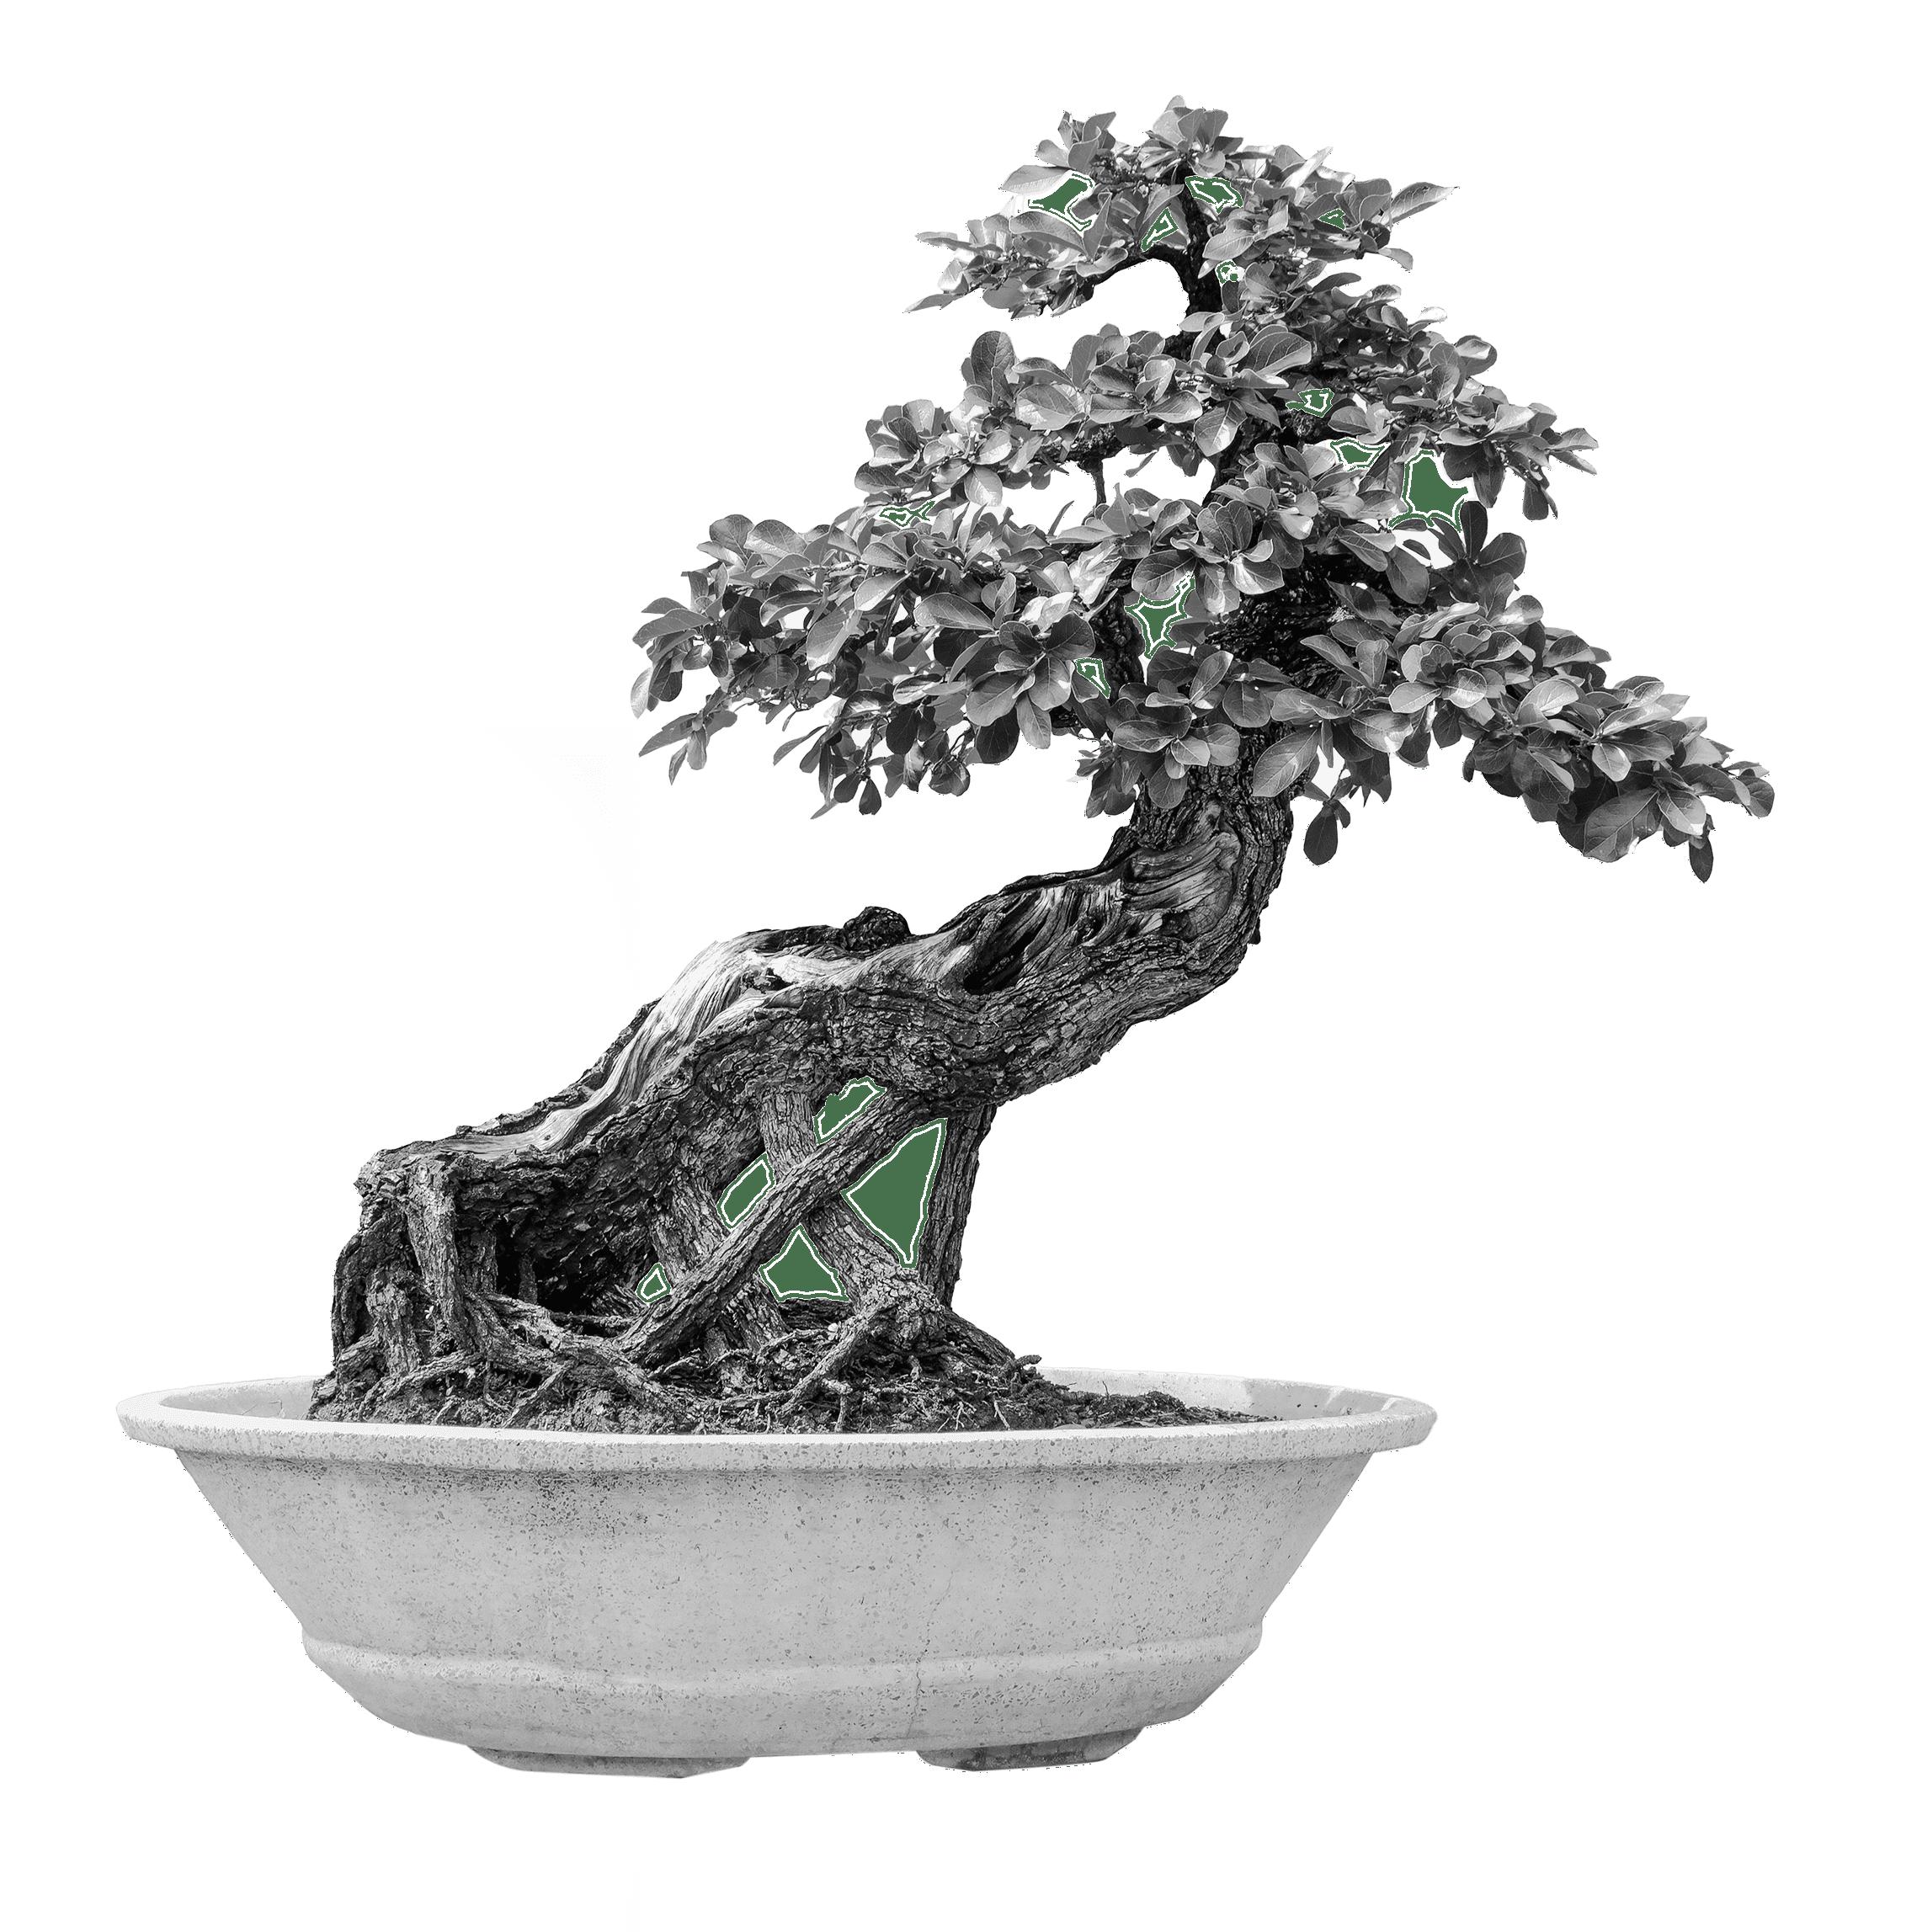 Black and white bonsai tree